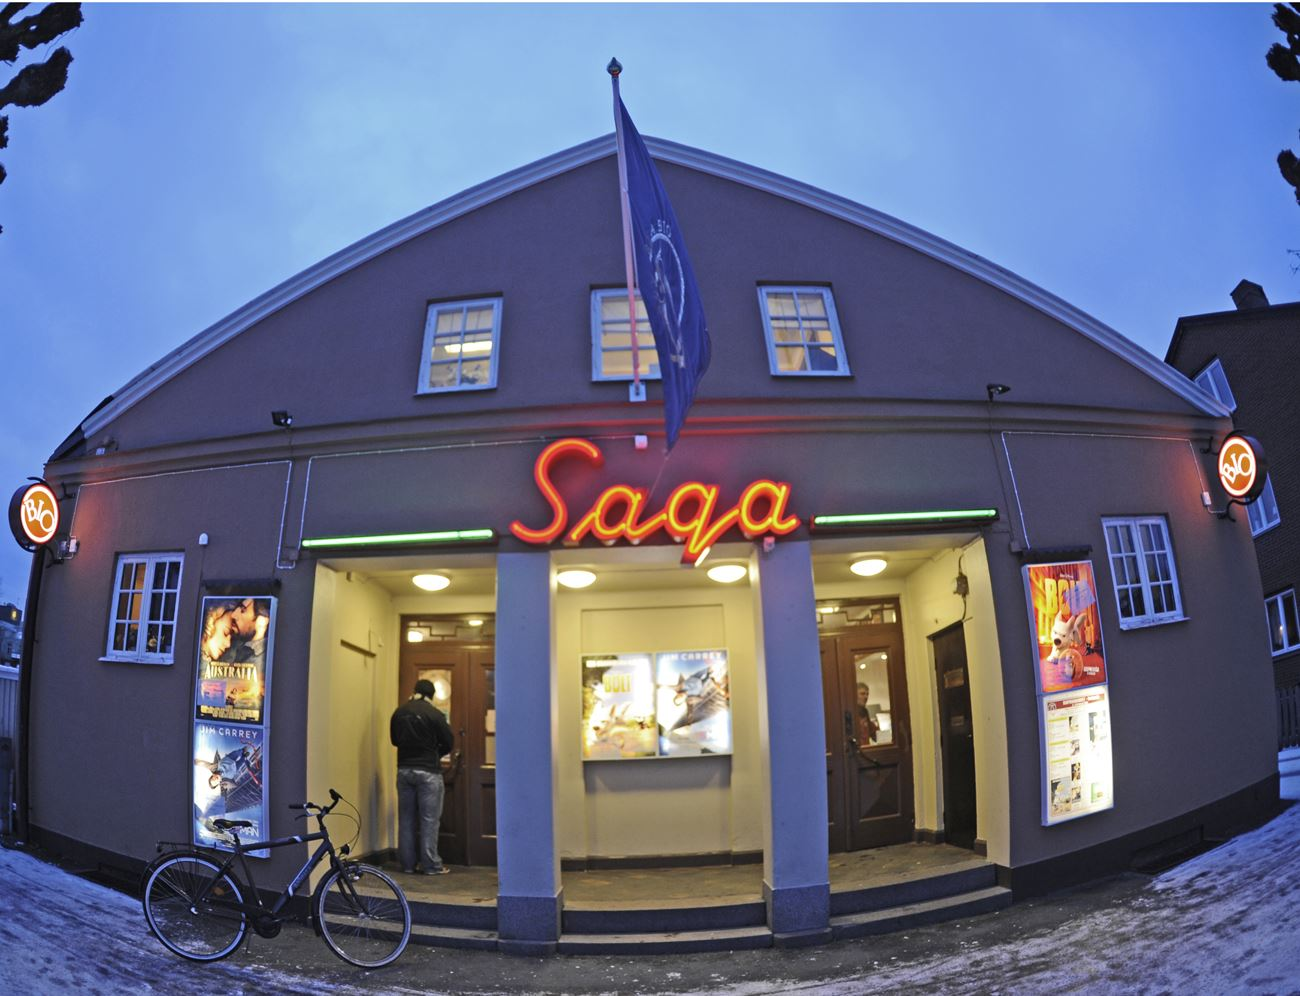 © Vetlanda Turistbyrå, Sagabiografen - Vetlanda